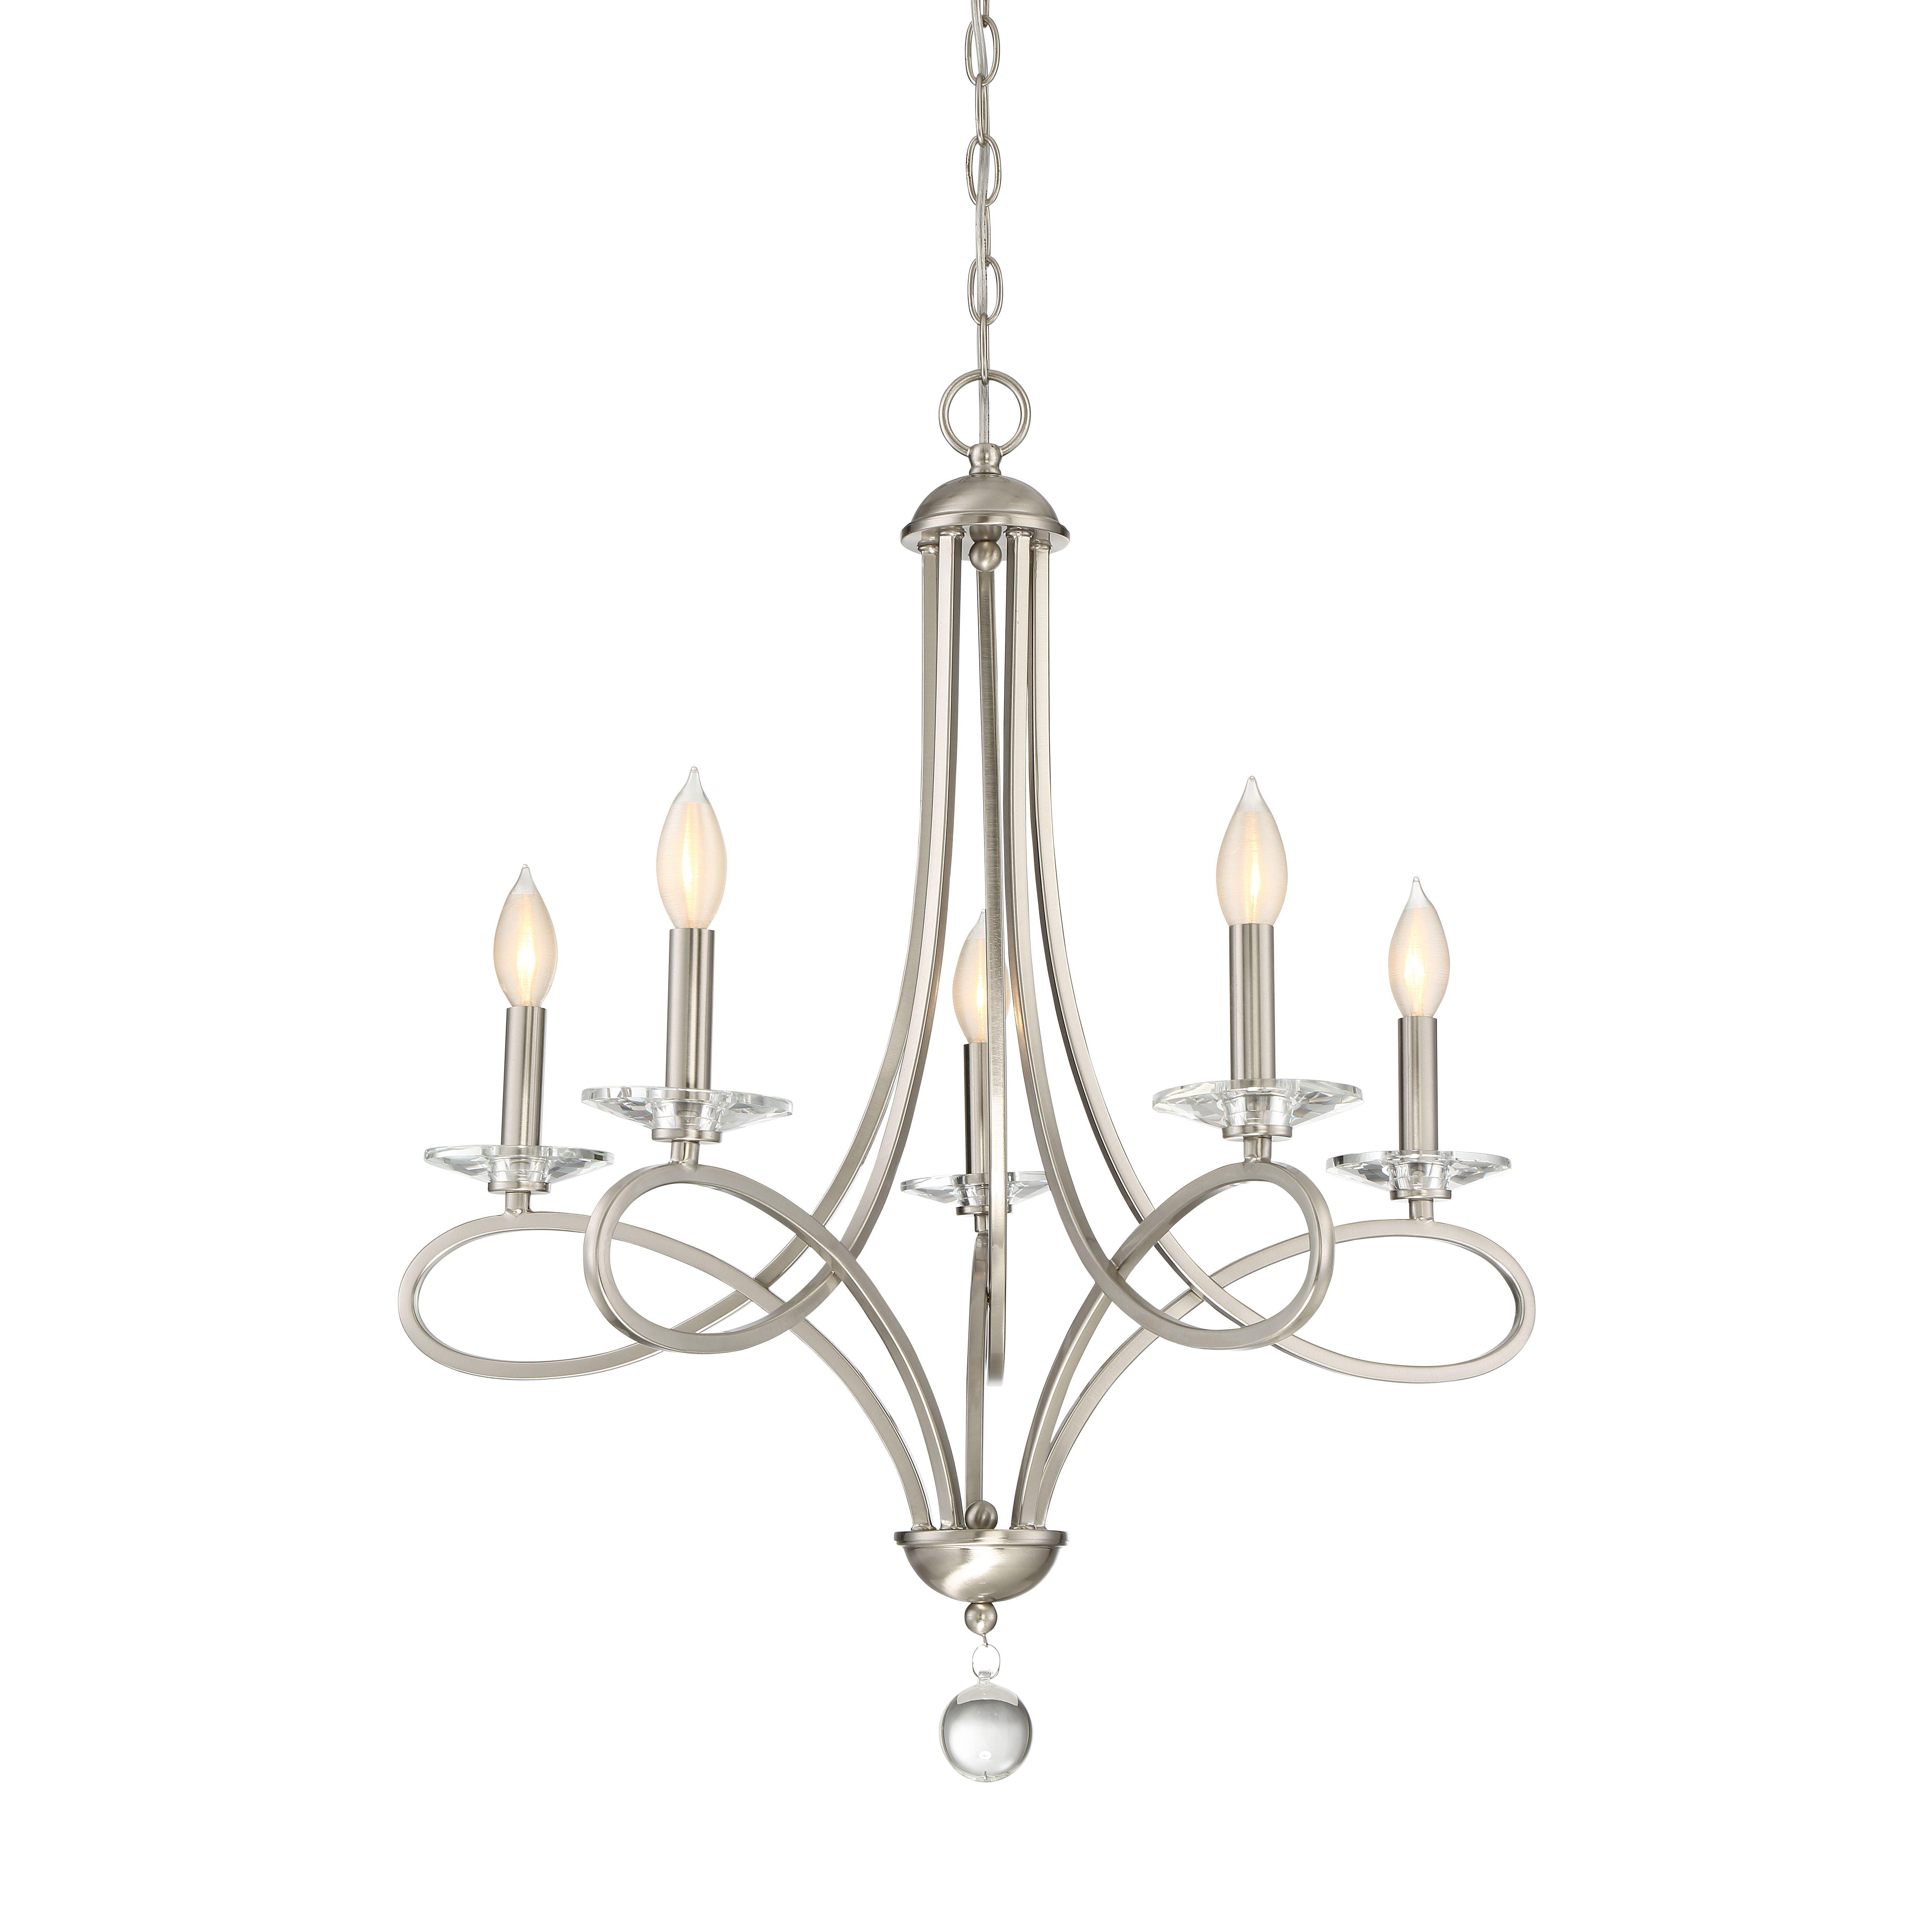 House Of Hampton Weingarten 5 Light Candle Style